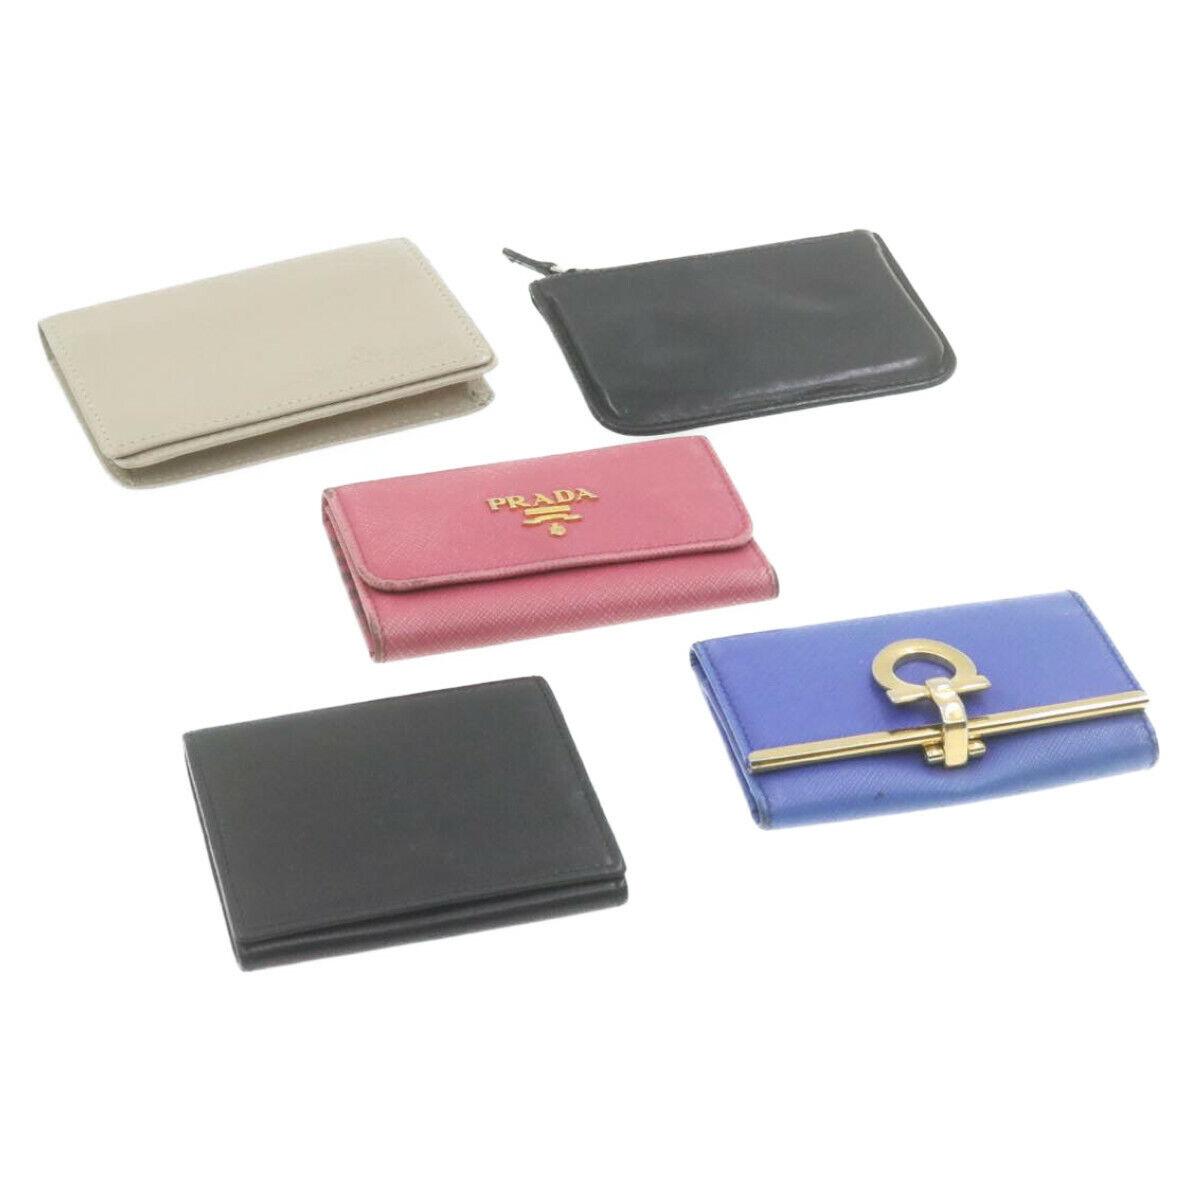 PRADA Salvatore Ferragamo Dunhill Leather Keycase Coin case 5set Auth cr815